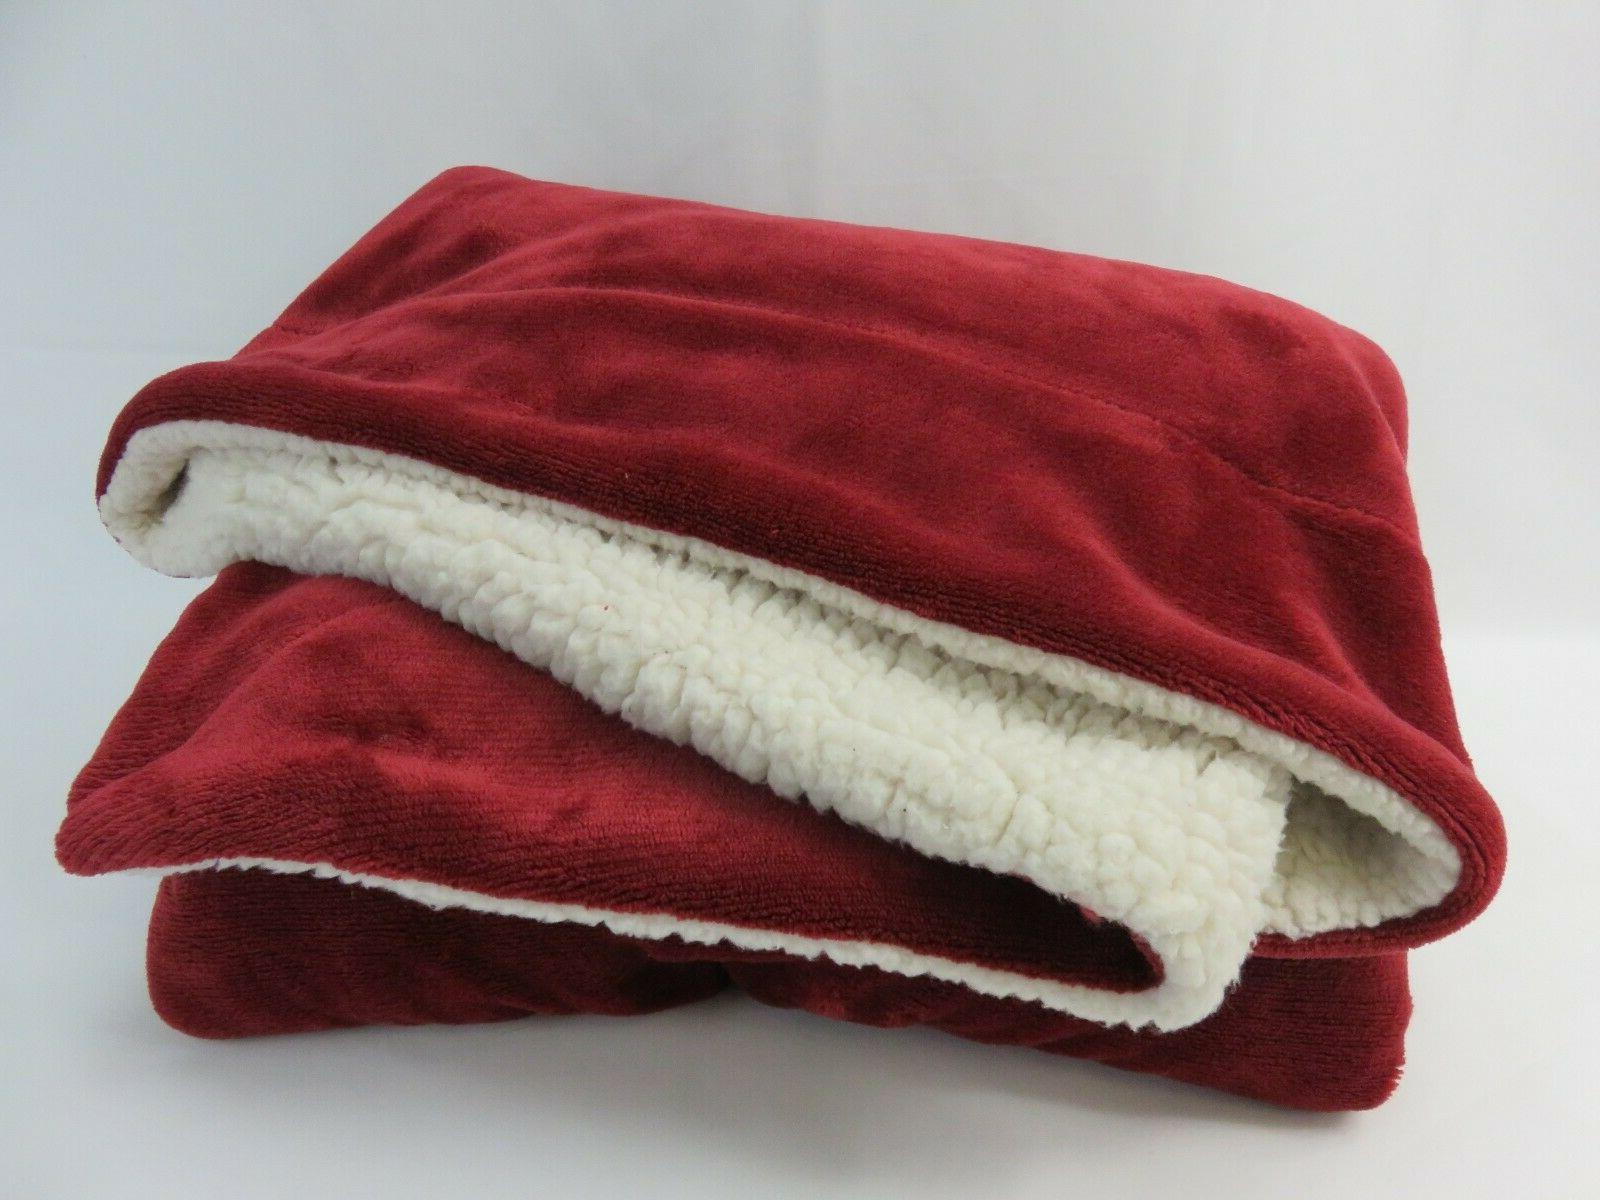 BEDSURE Blanket 65in Plush Blanket Soft